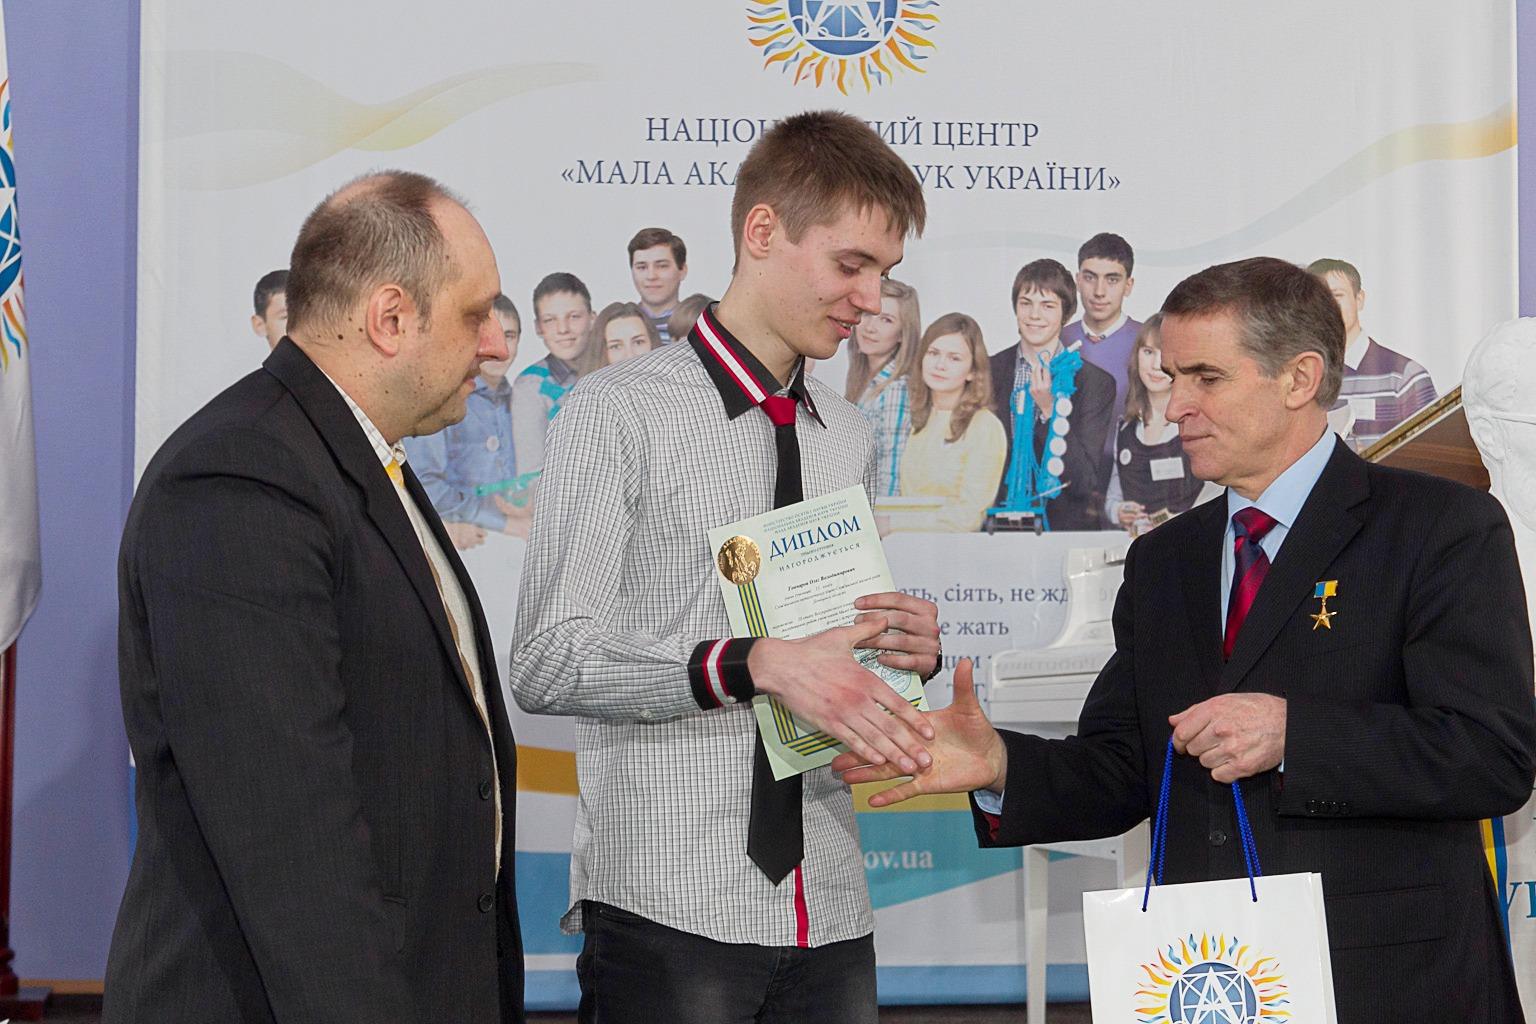 Олег Гончаров - учасник Всеукраїнського етапу конкурсу-захисту наукових робіт МАН